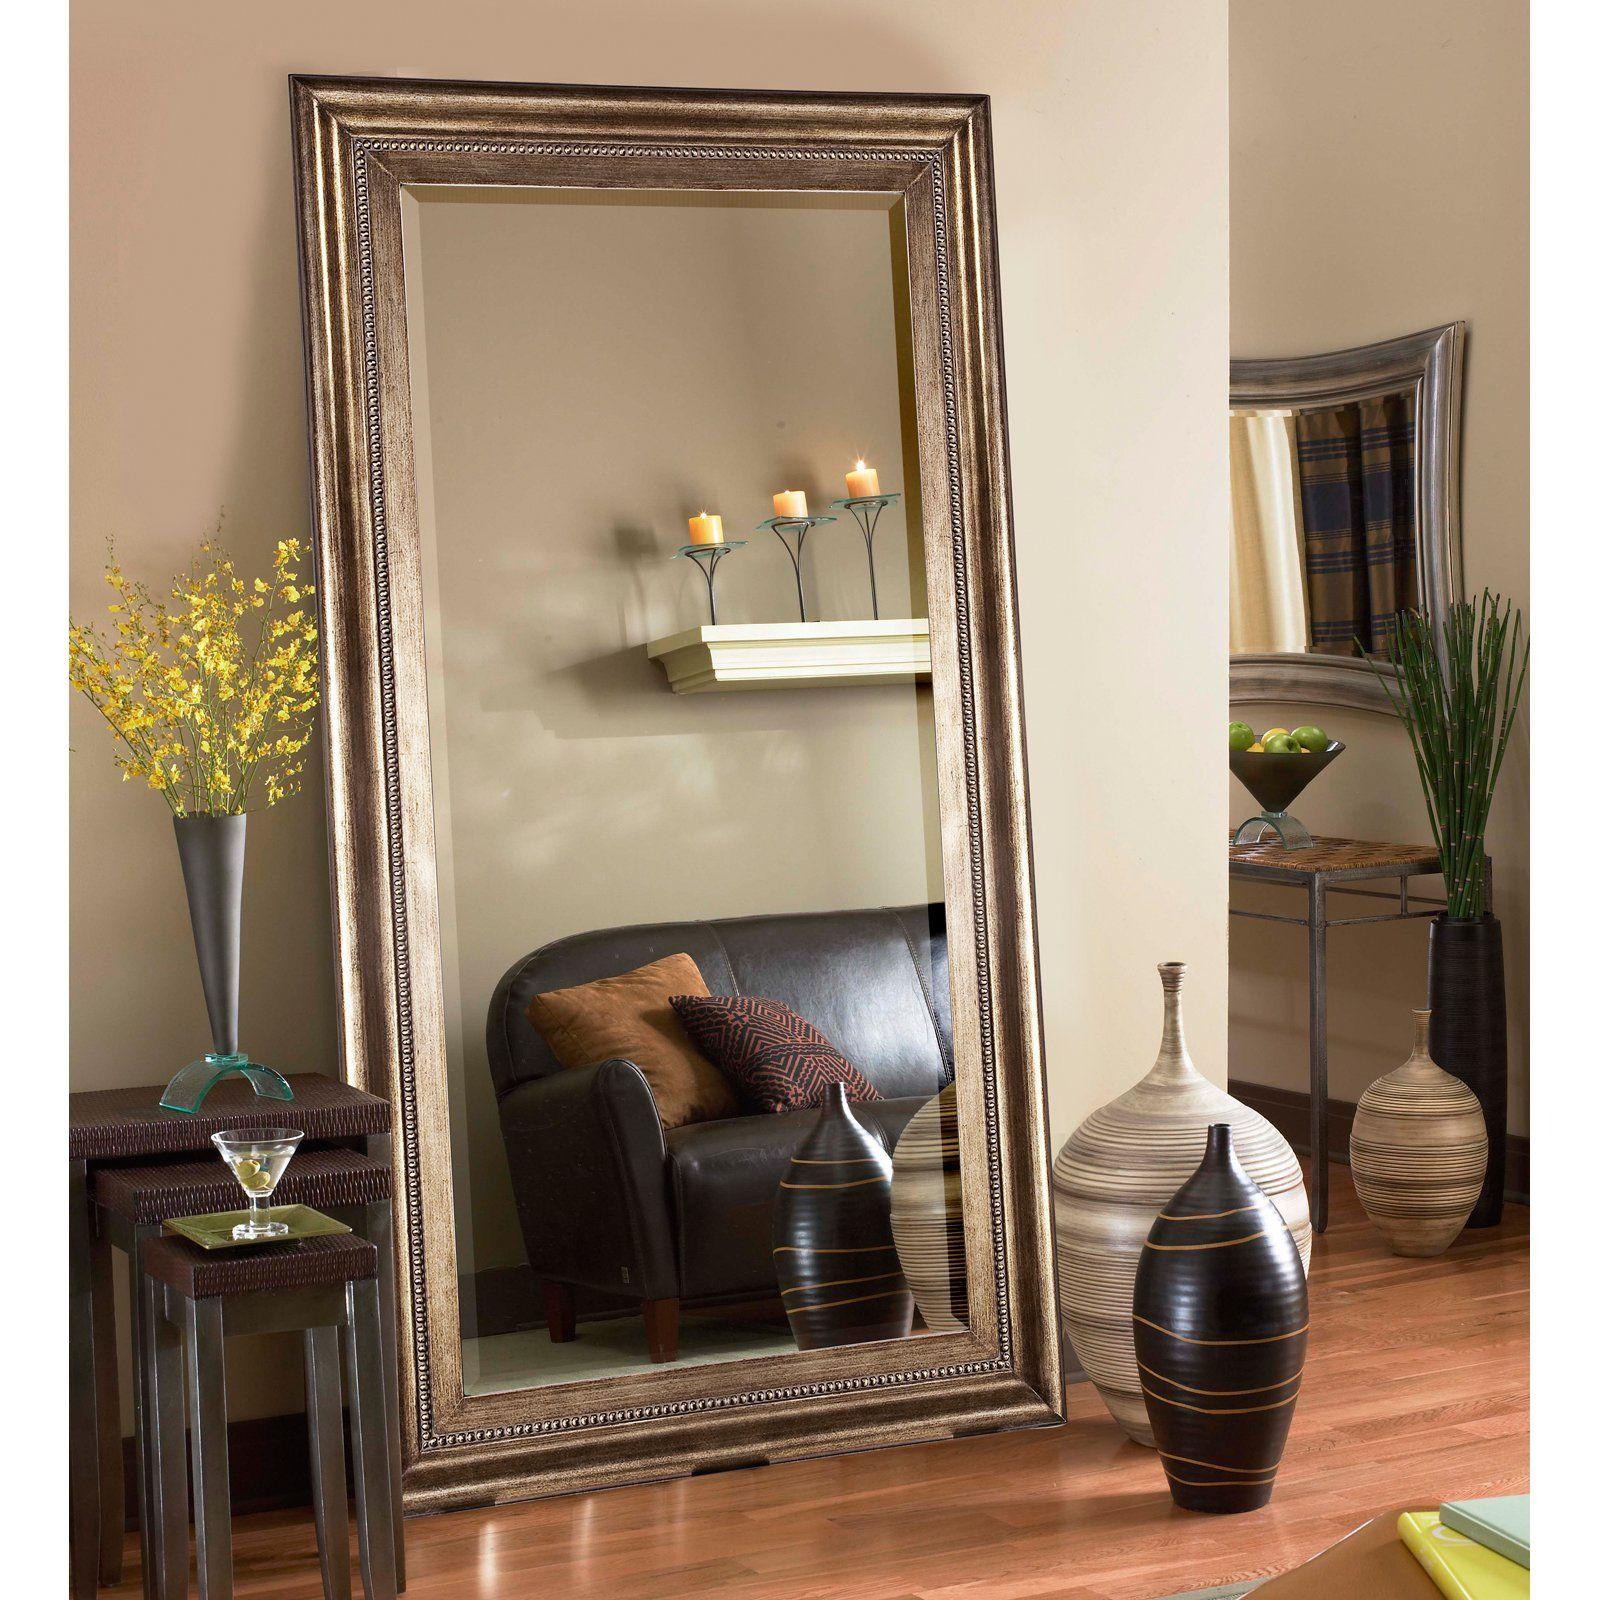 Elizabeth Austin Marla Oversized Mirror 43w X 81h In Floor Mirror Living Room Mirror Decor Living Room Living Room Mirrors #standing #vase #for #living #room